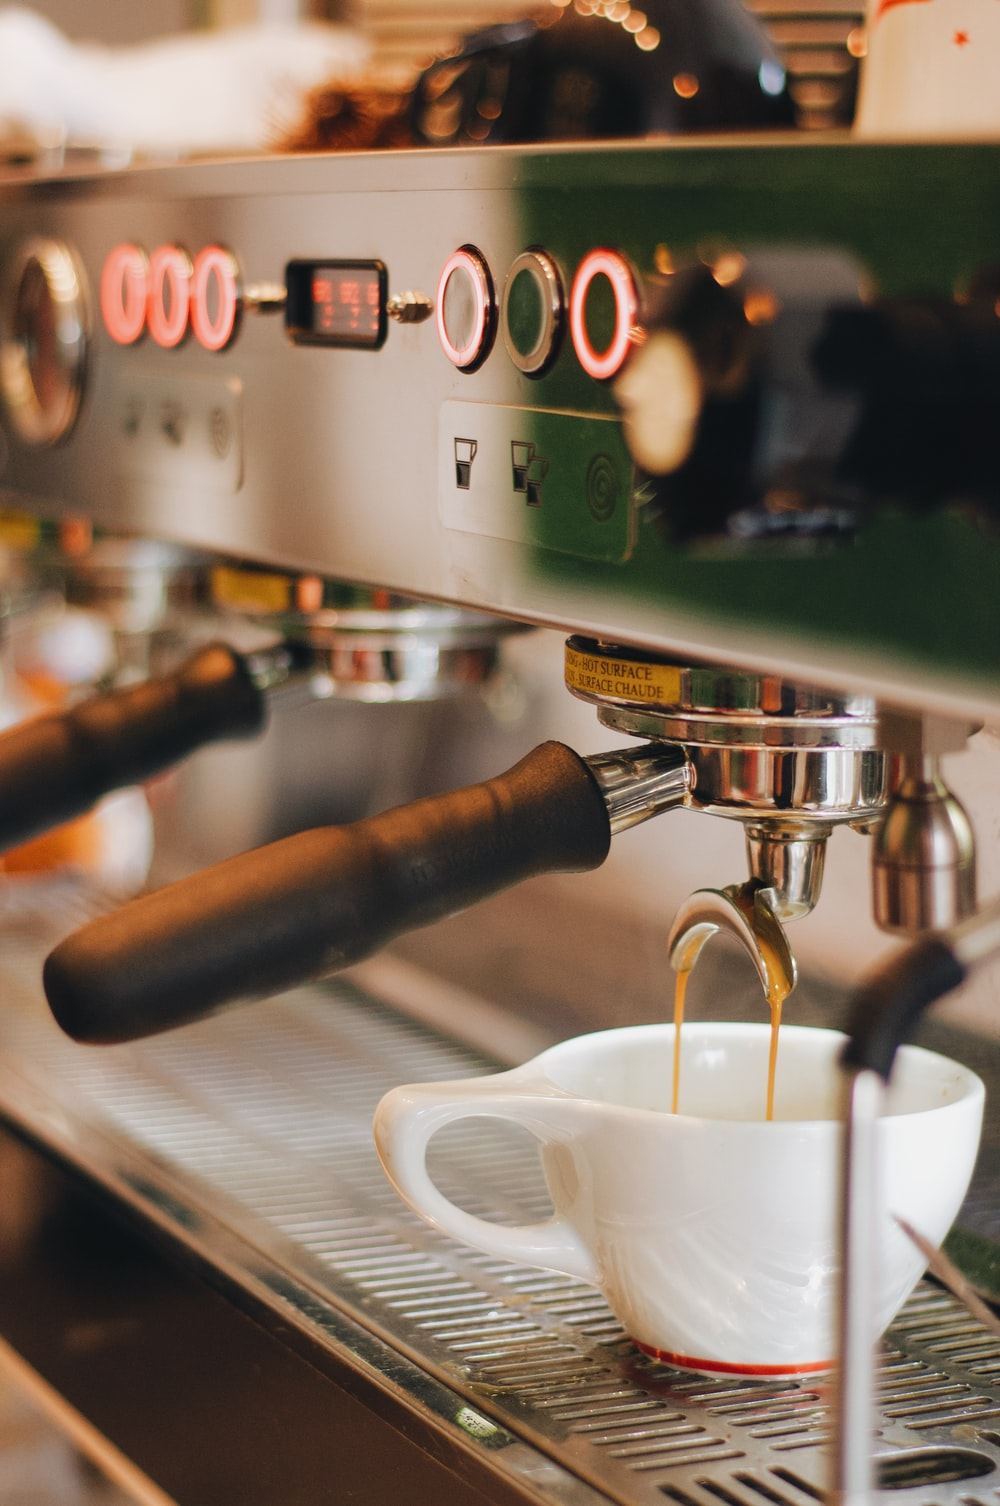 white ceramic mug on silver espresso machine